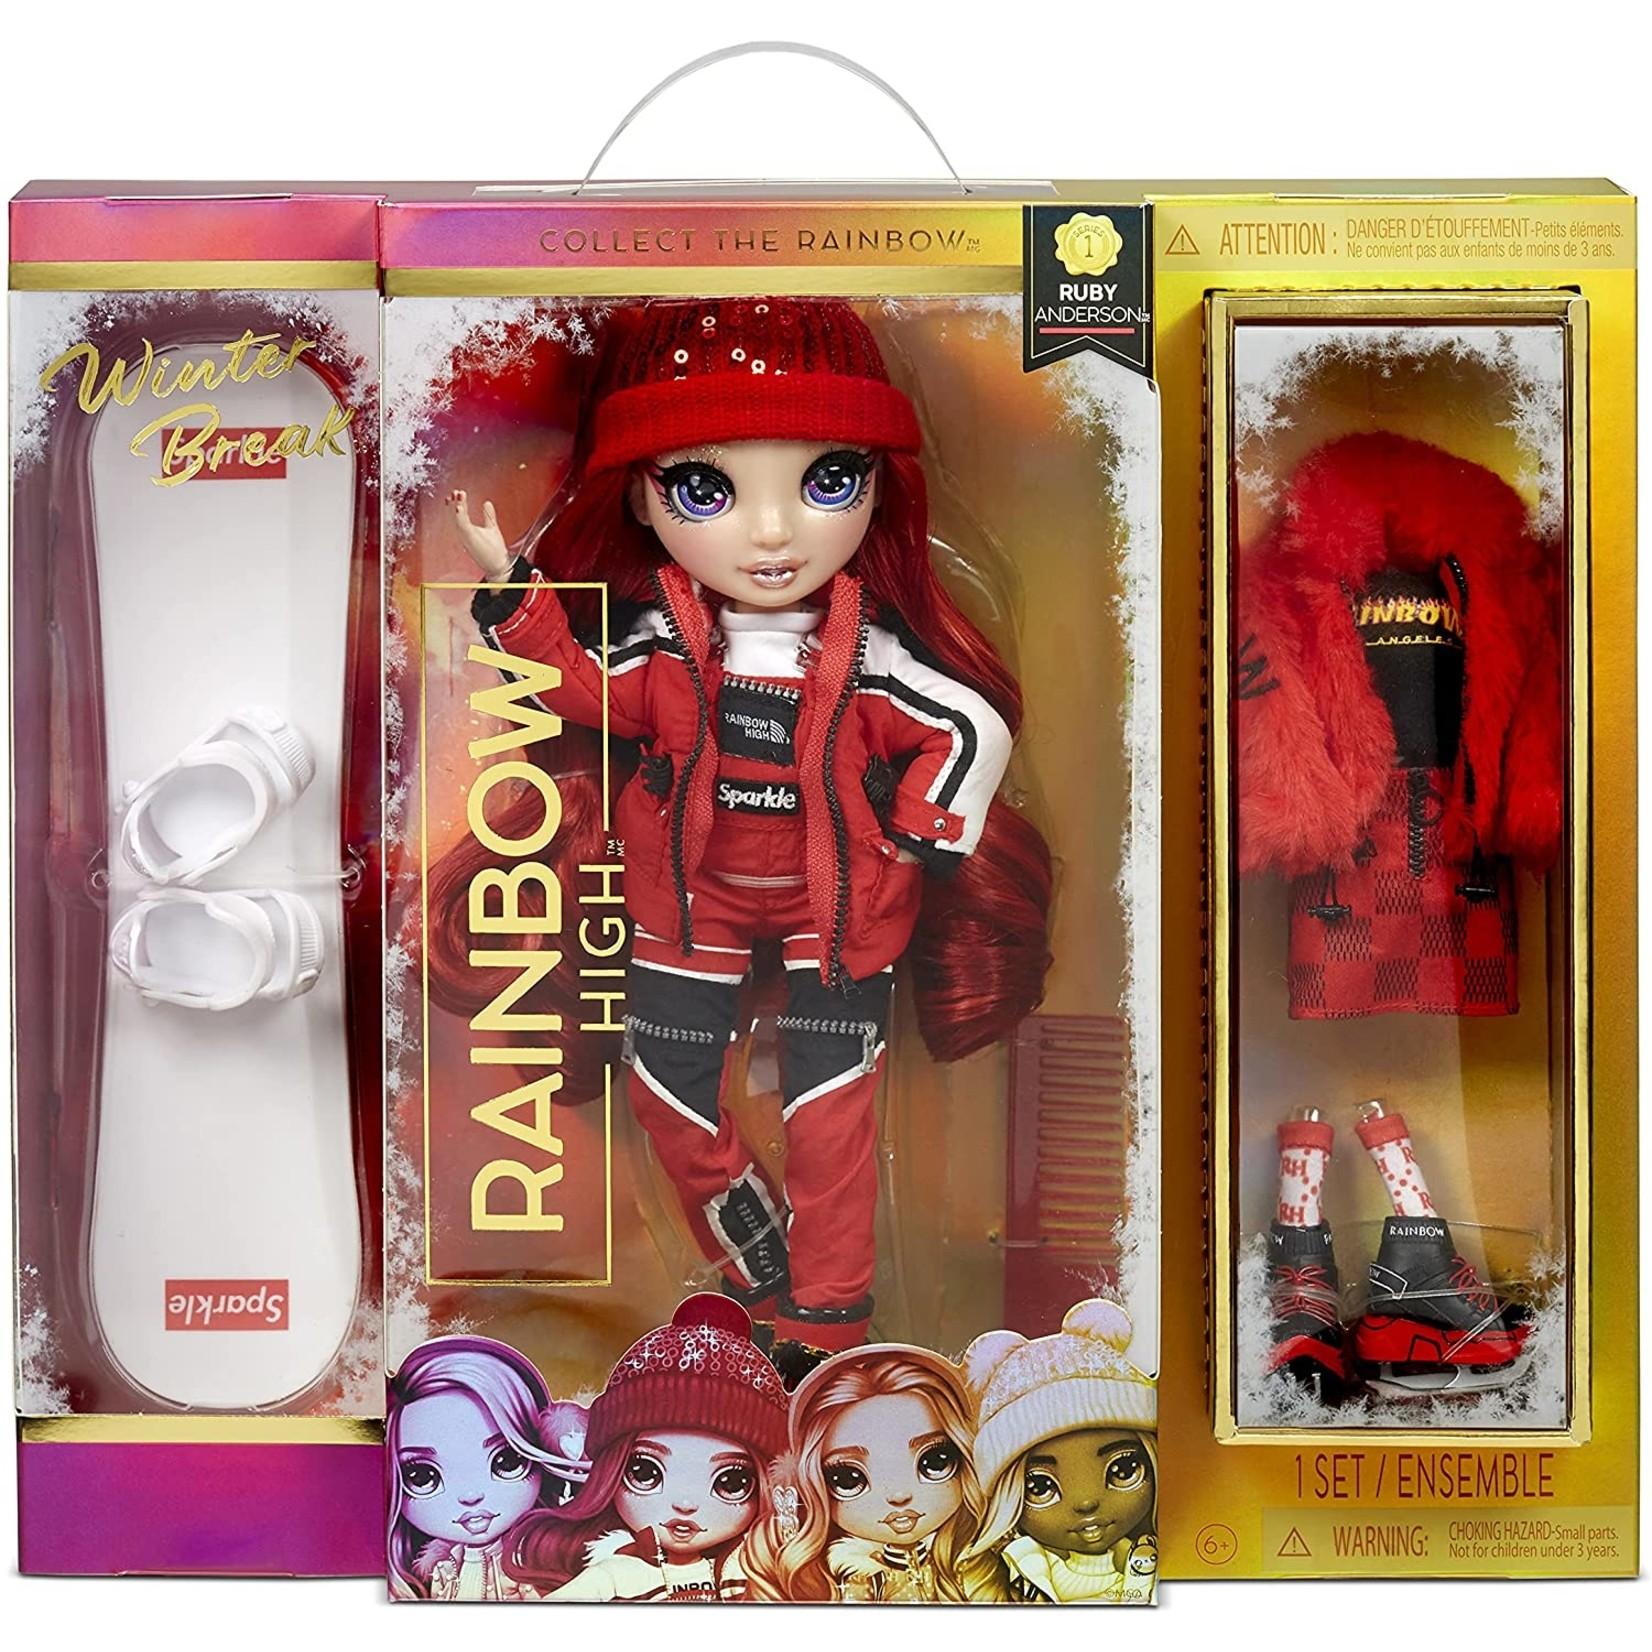 MGA Entertainment Rainbow High Winterbreak Doll - Ruby Anderson